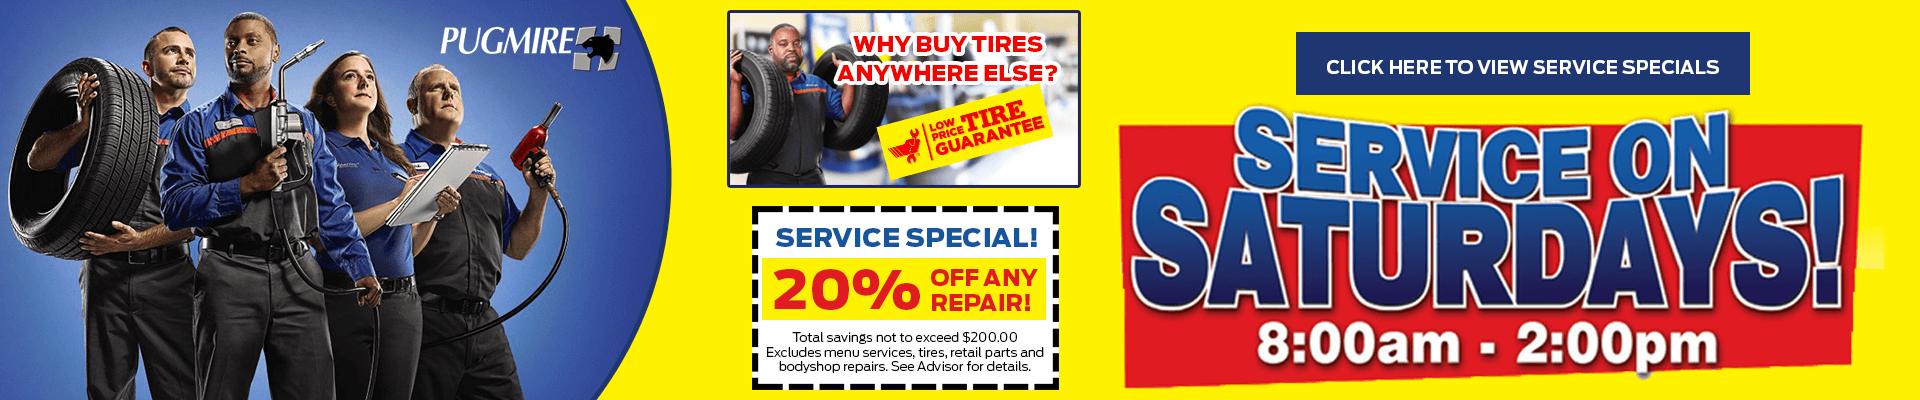 car repair service special